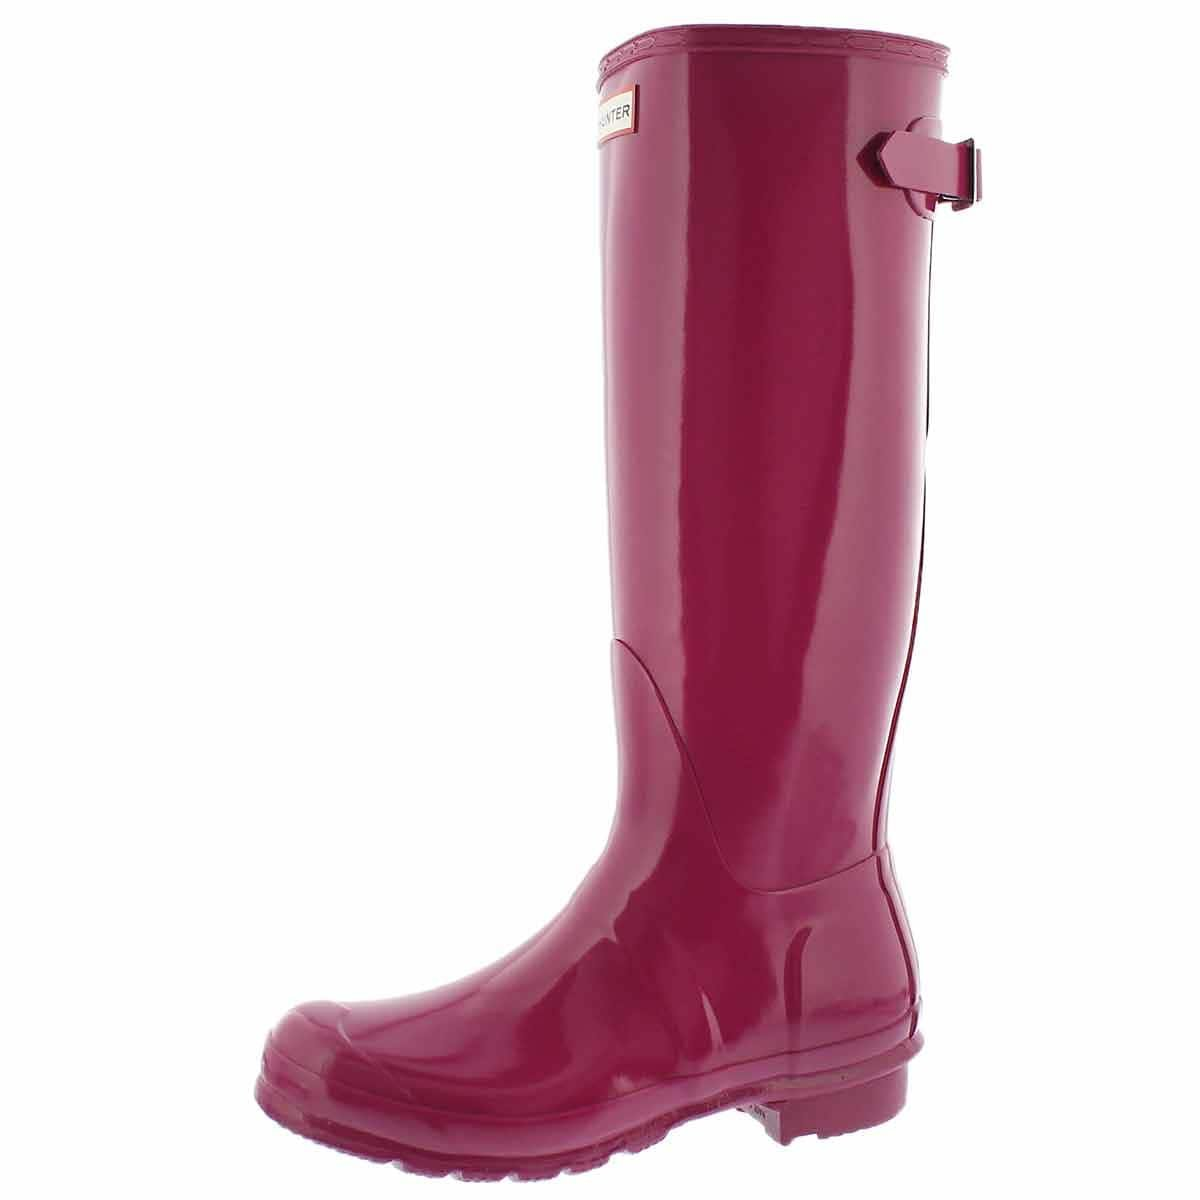 Hunter Boots Women's Original Back Adjustable Gloss Tall Rain Boot Iron Pnk 7 M US